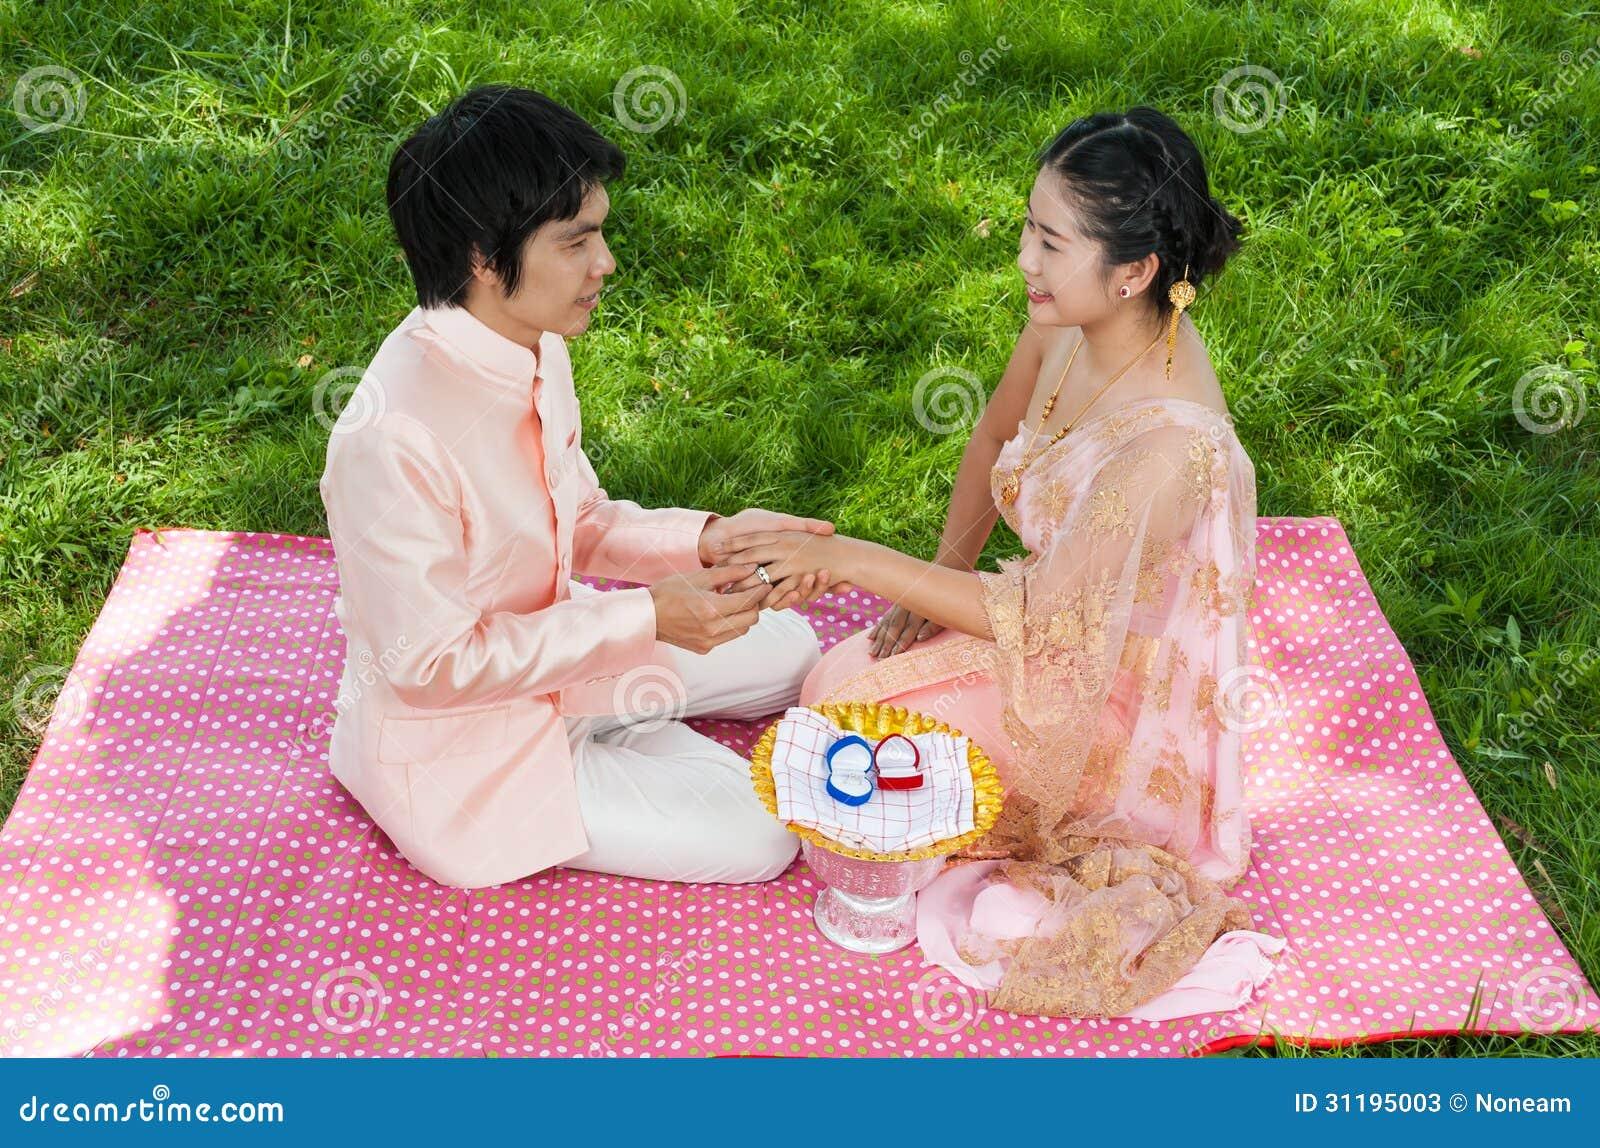 ASIAN BRIDES, ASIAN BRIDE, THAI BRIDES, THAI BRIDE